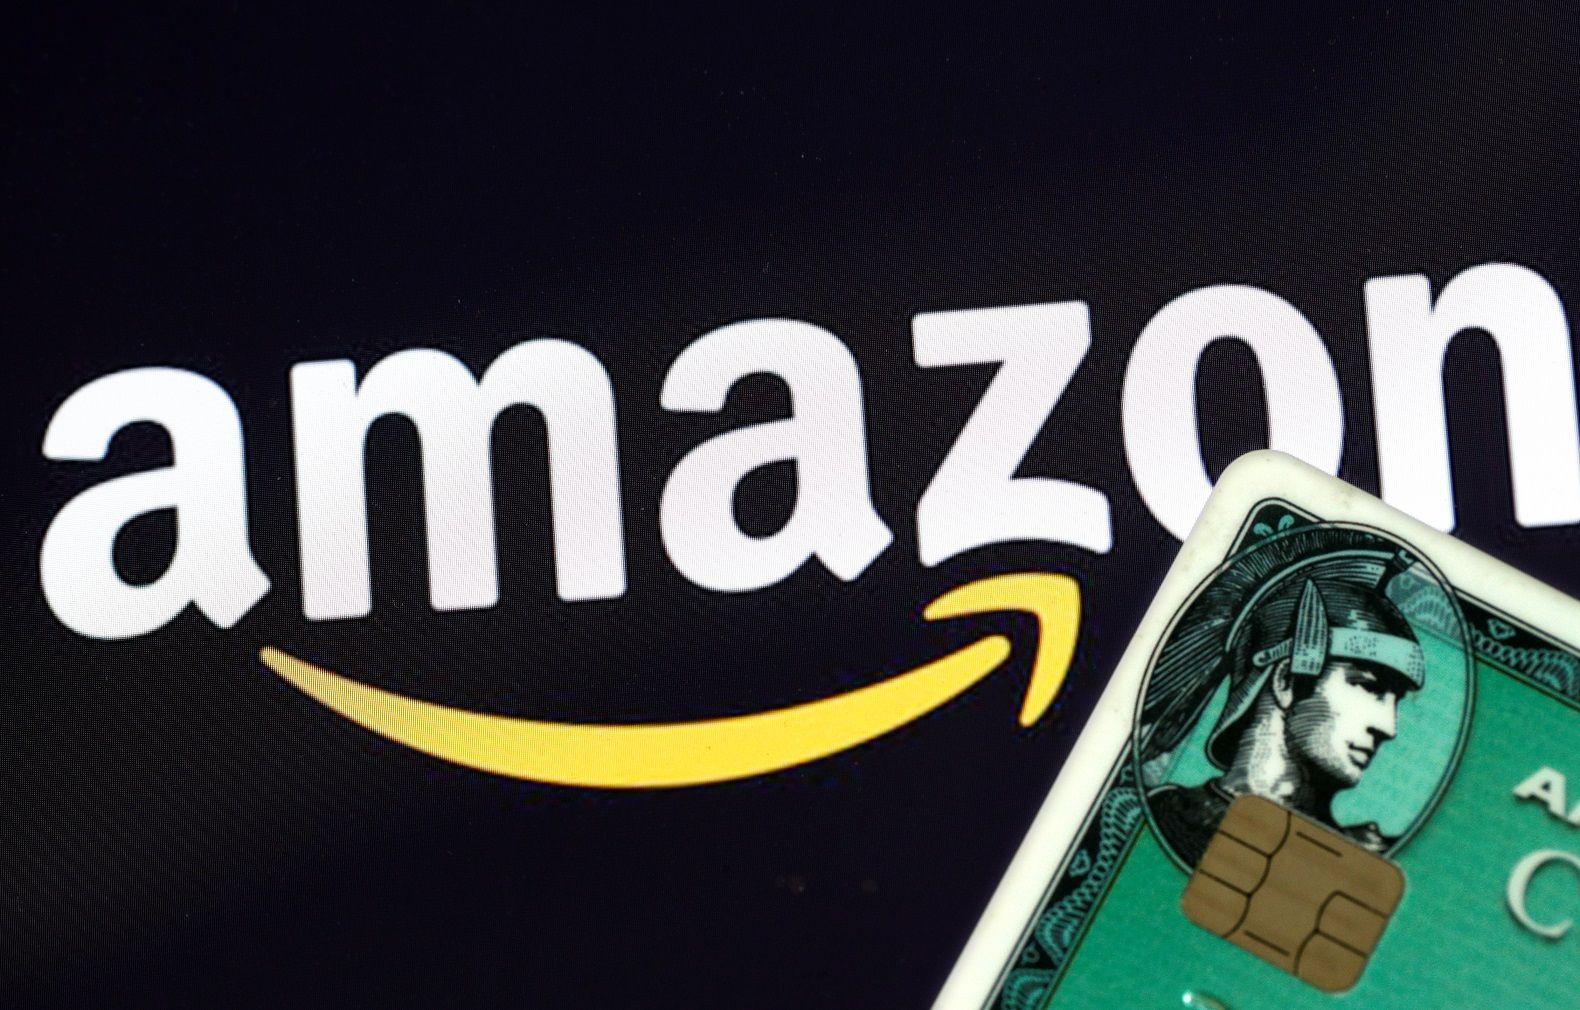 86cfa7ee8e8 Cyber Monday 2017  Amazon Deals on TVs